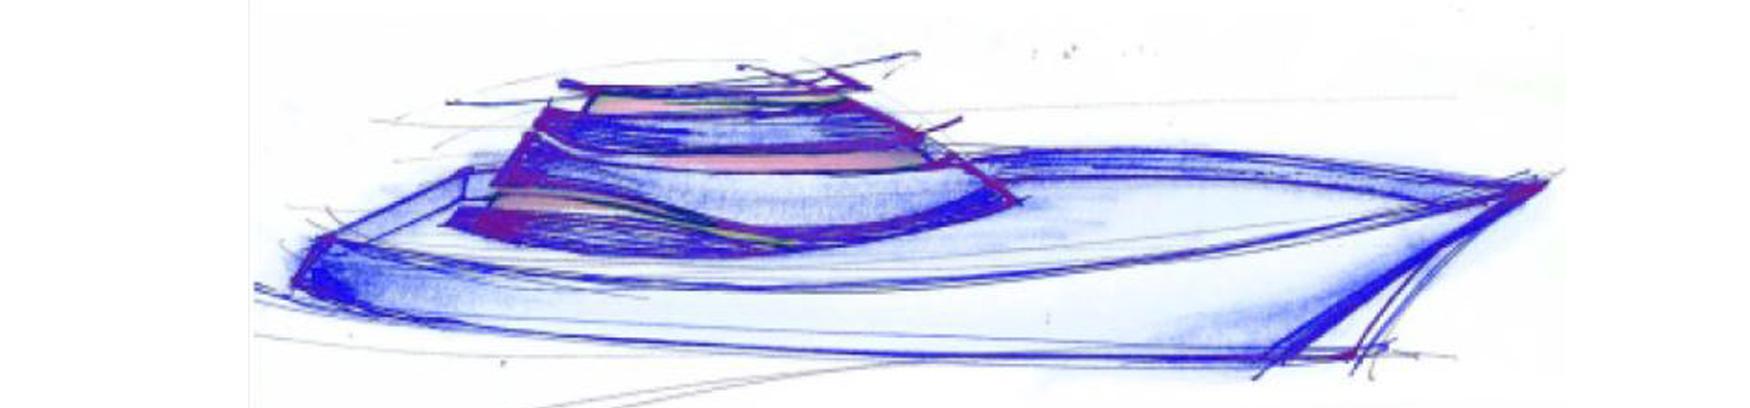 croquis-bateau